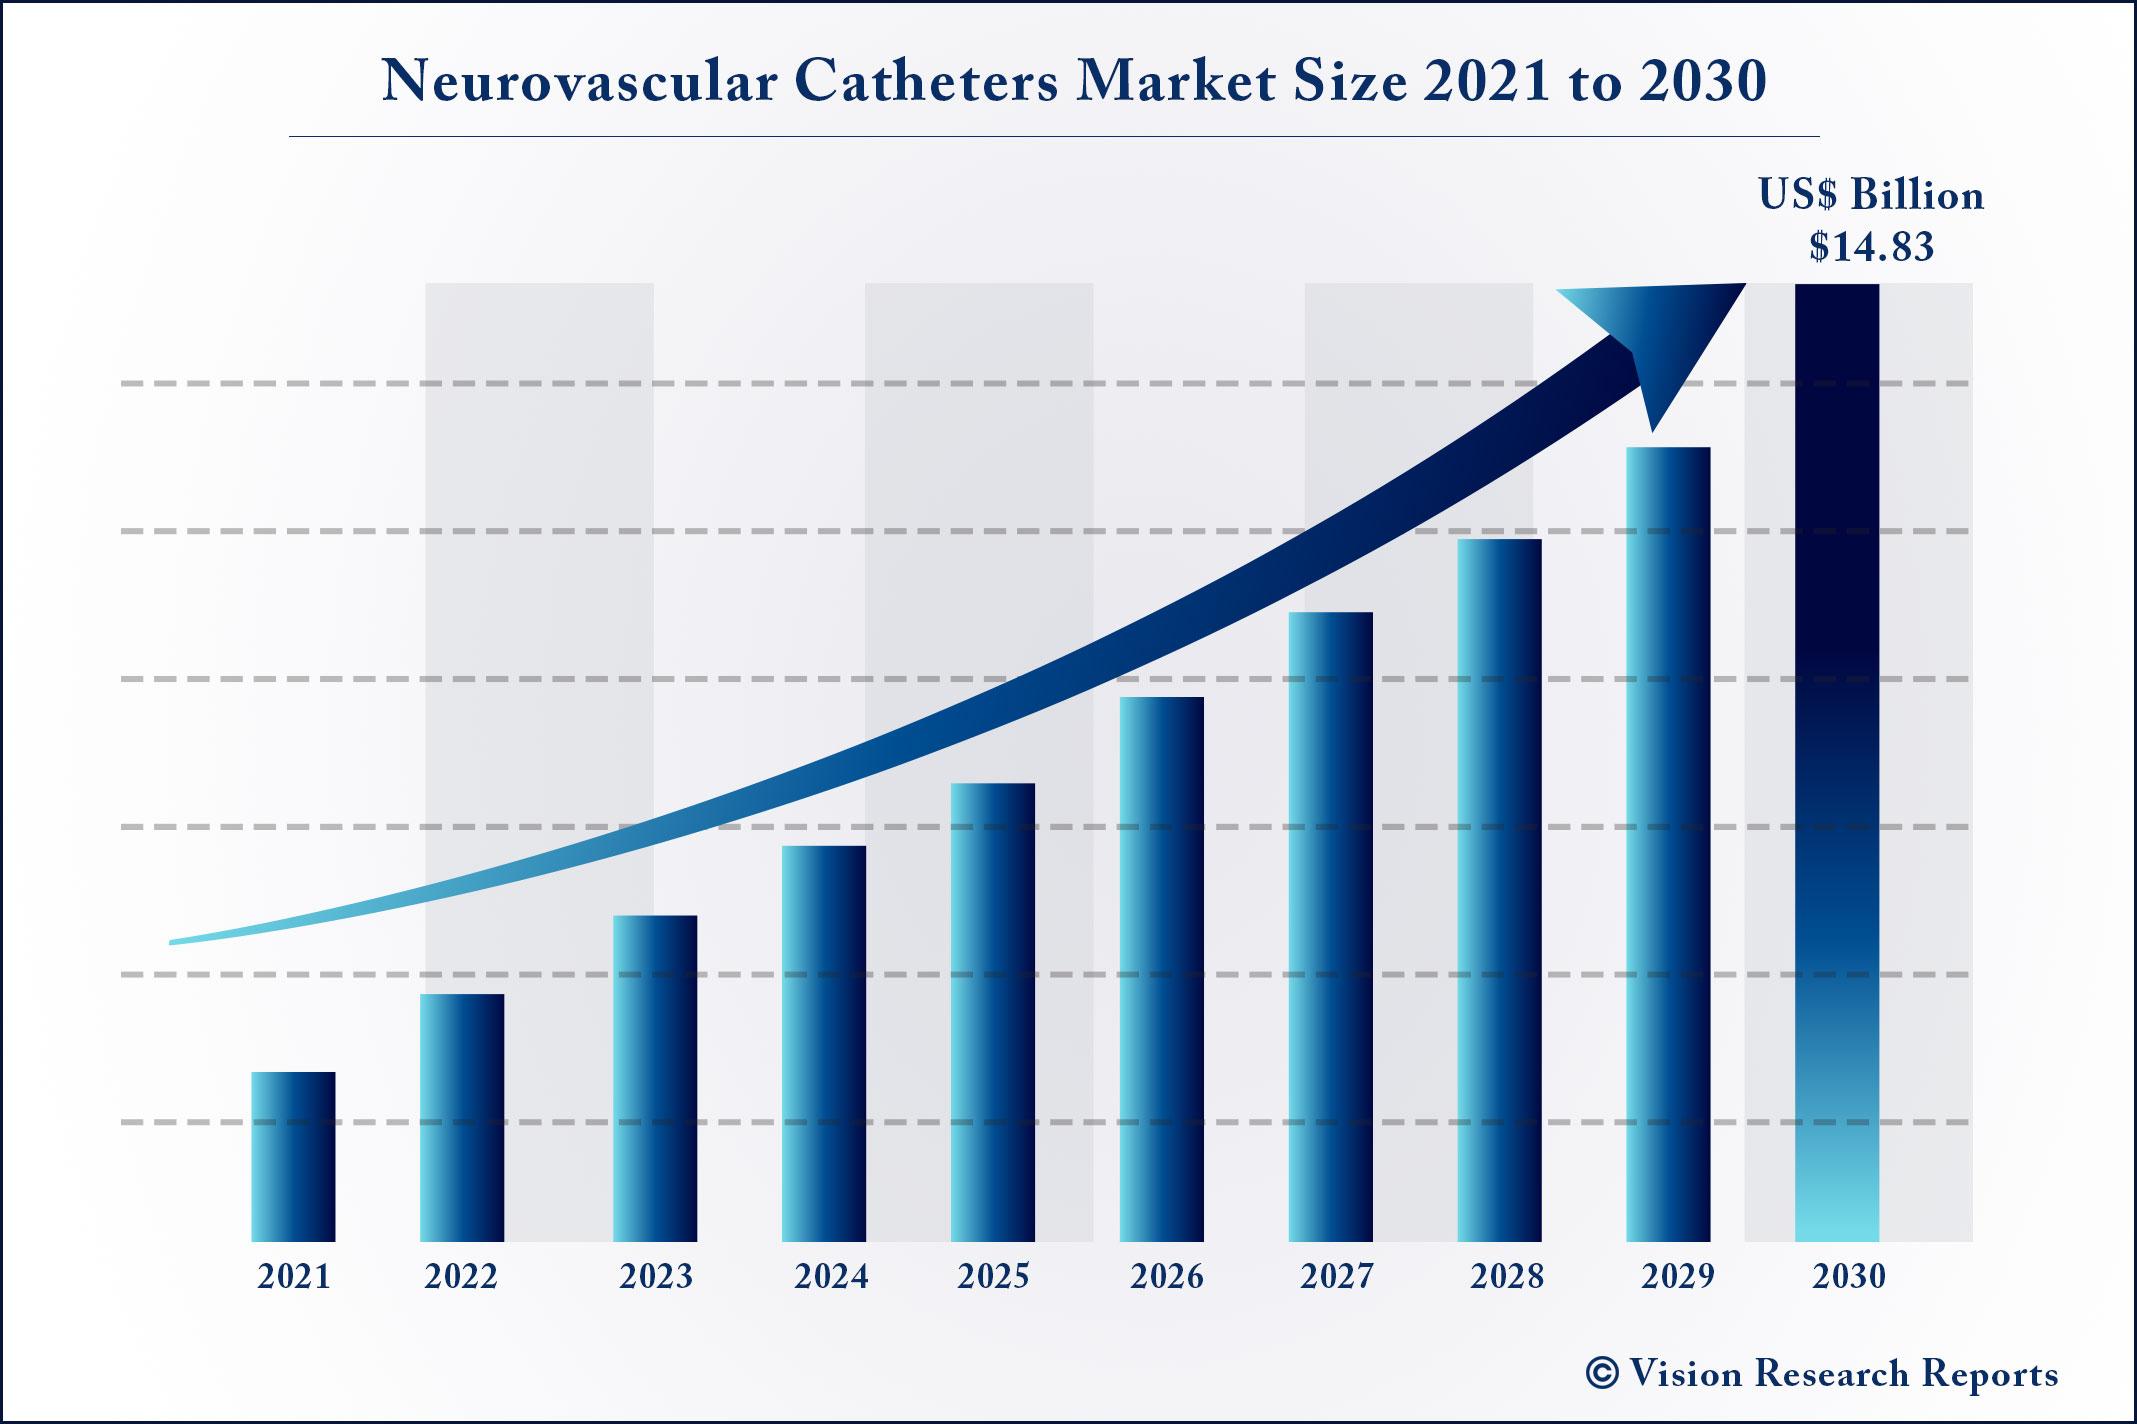 Neurovascular Catheters Market Size 2021 to 2030